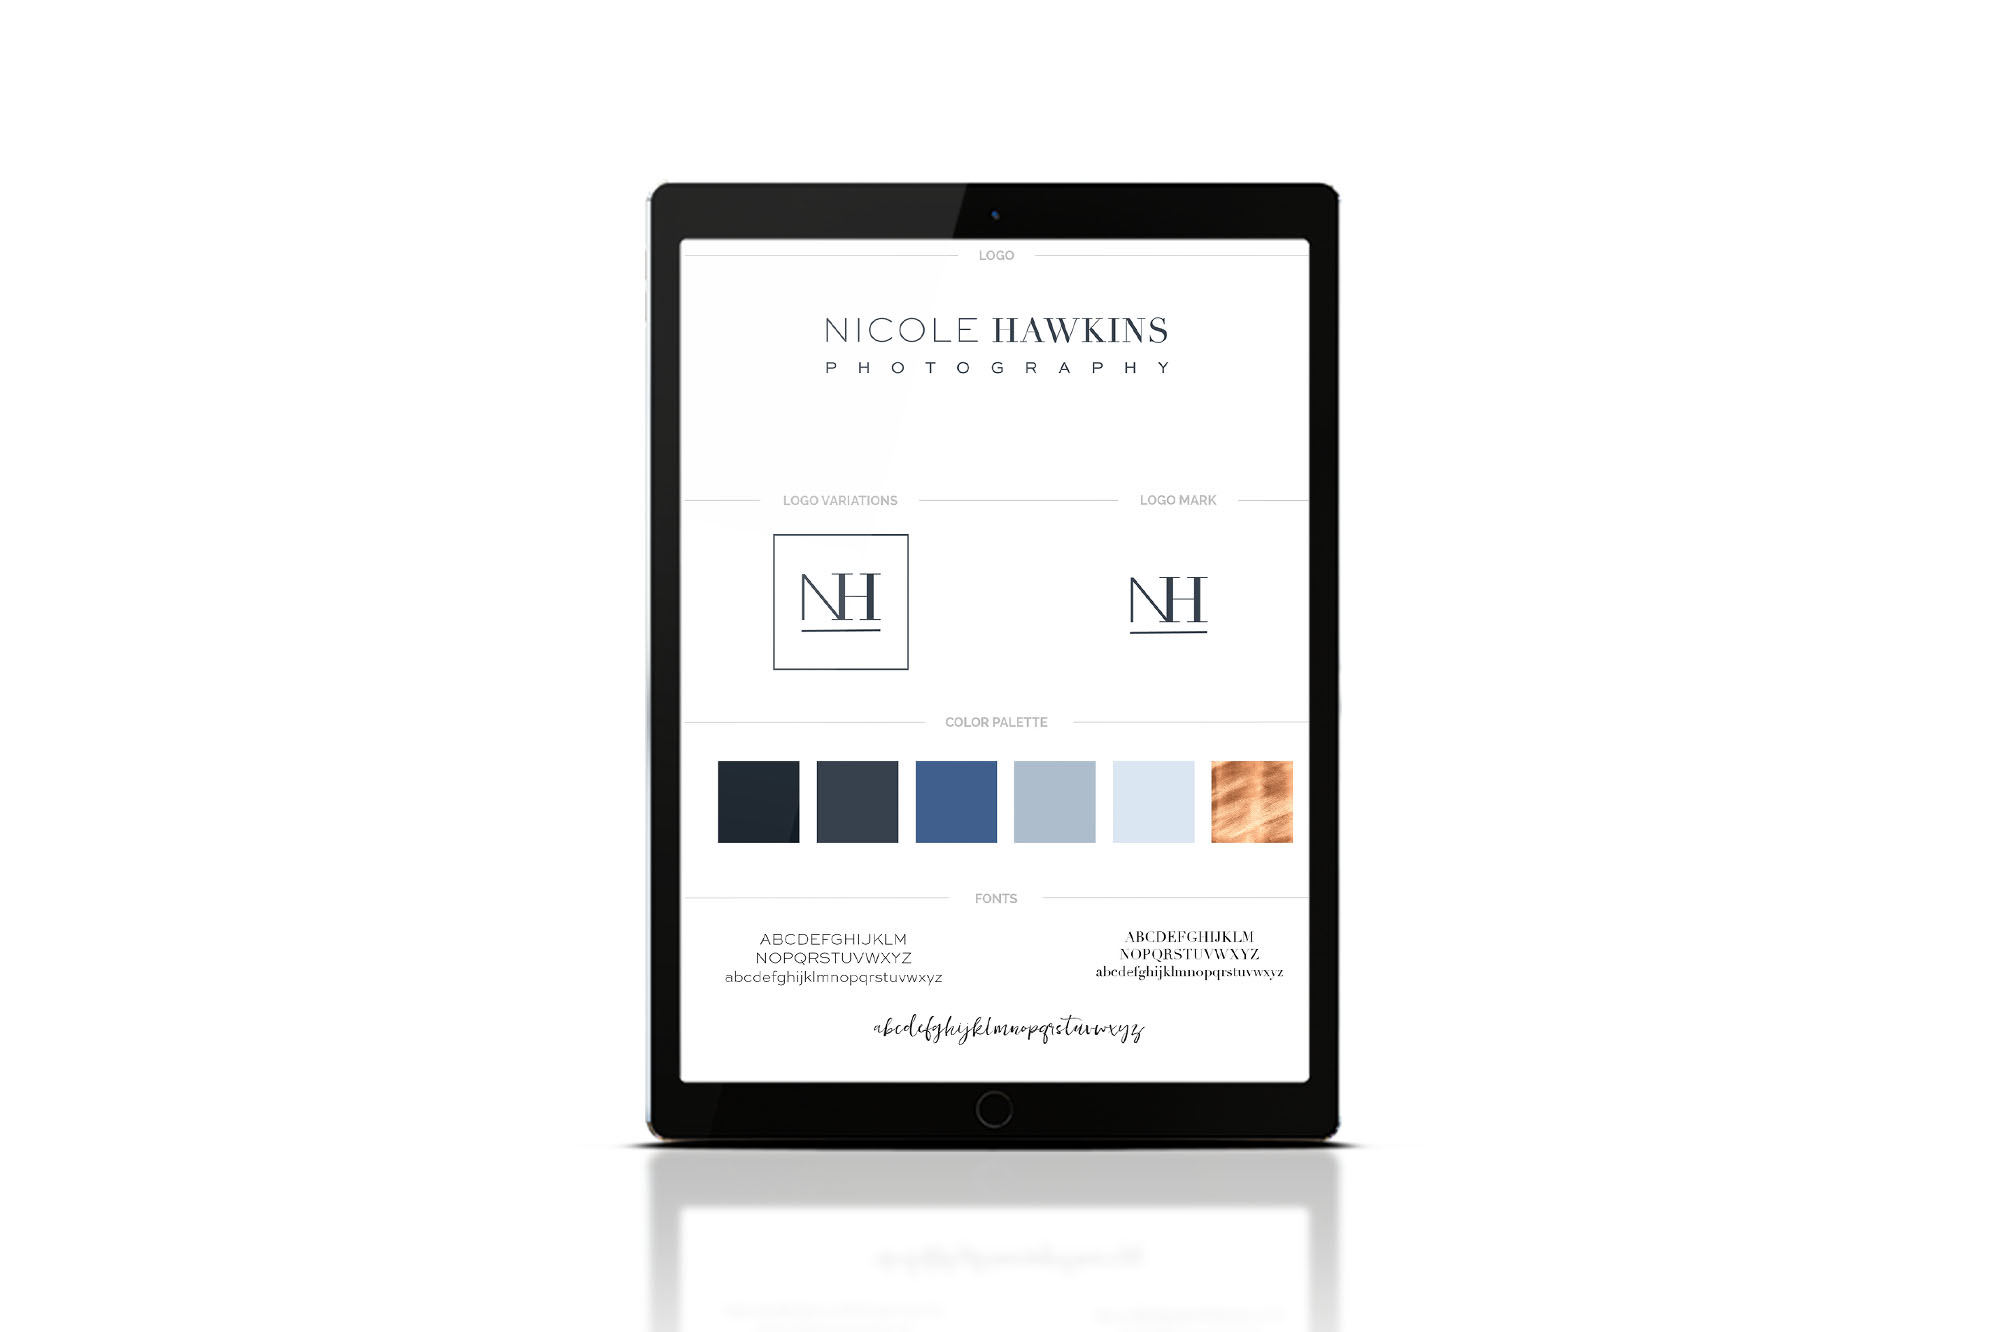 Nicole-Hawkins-Photography-calm-blue-branding-board-inspiration-.jpg